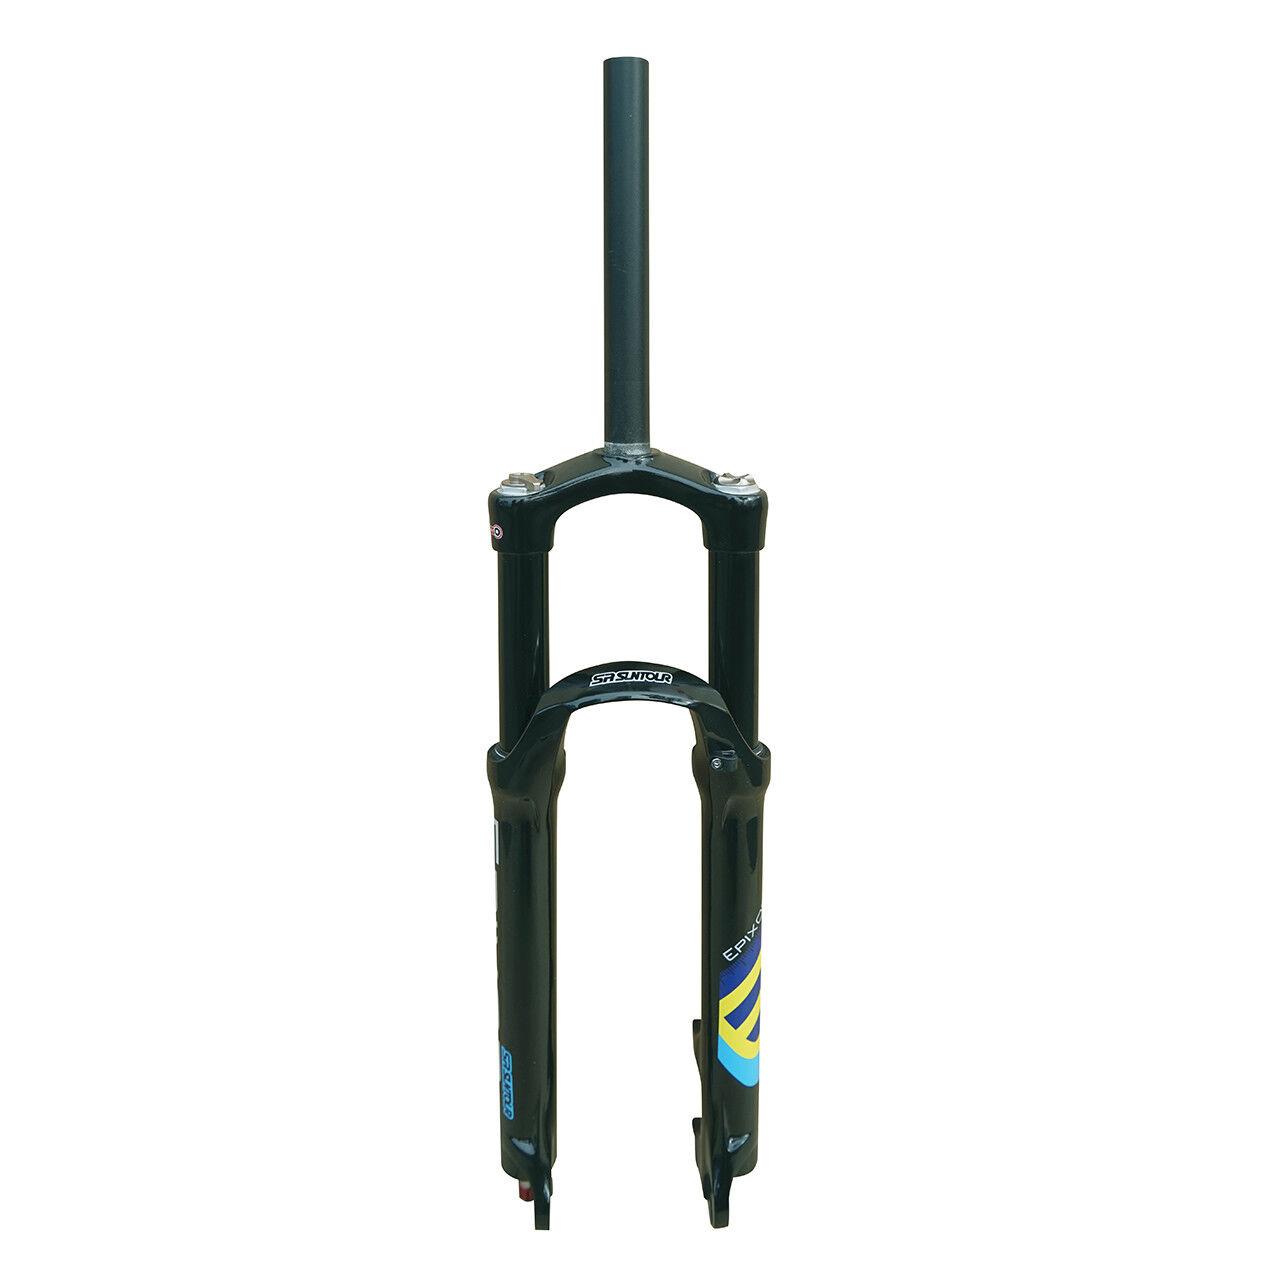 SR SUNTOUR Epixon LO-R MTB Suspension Fork TK 26  1-1 8  Travel 120mm Bright BK